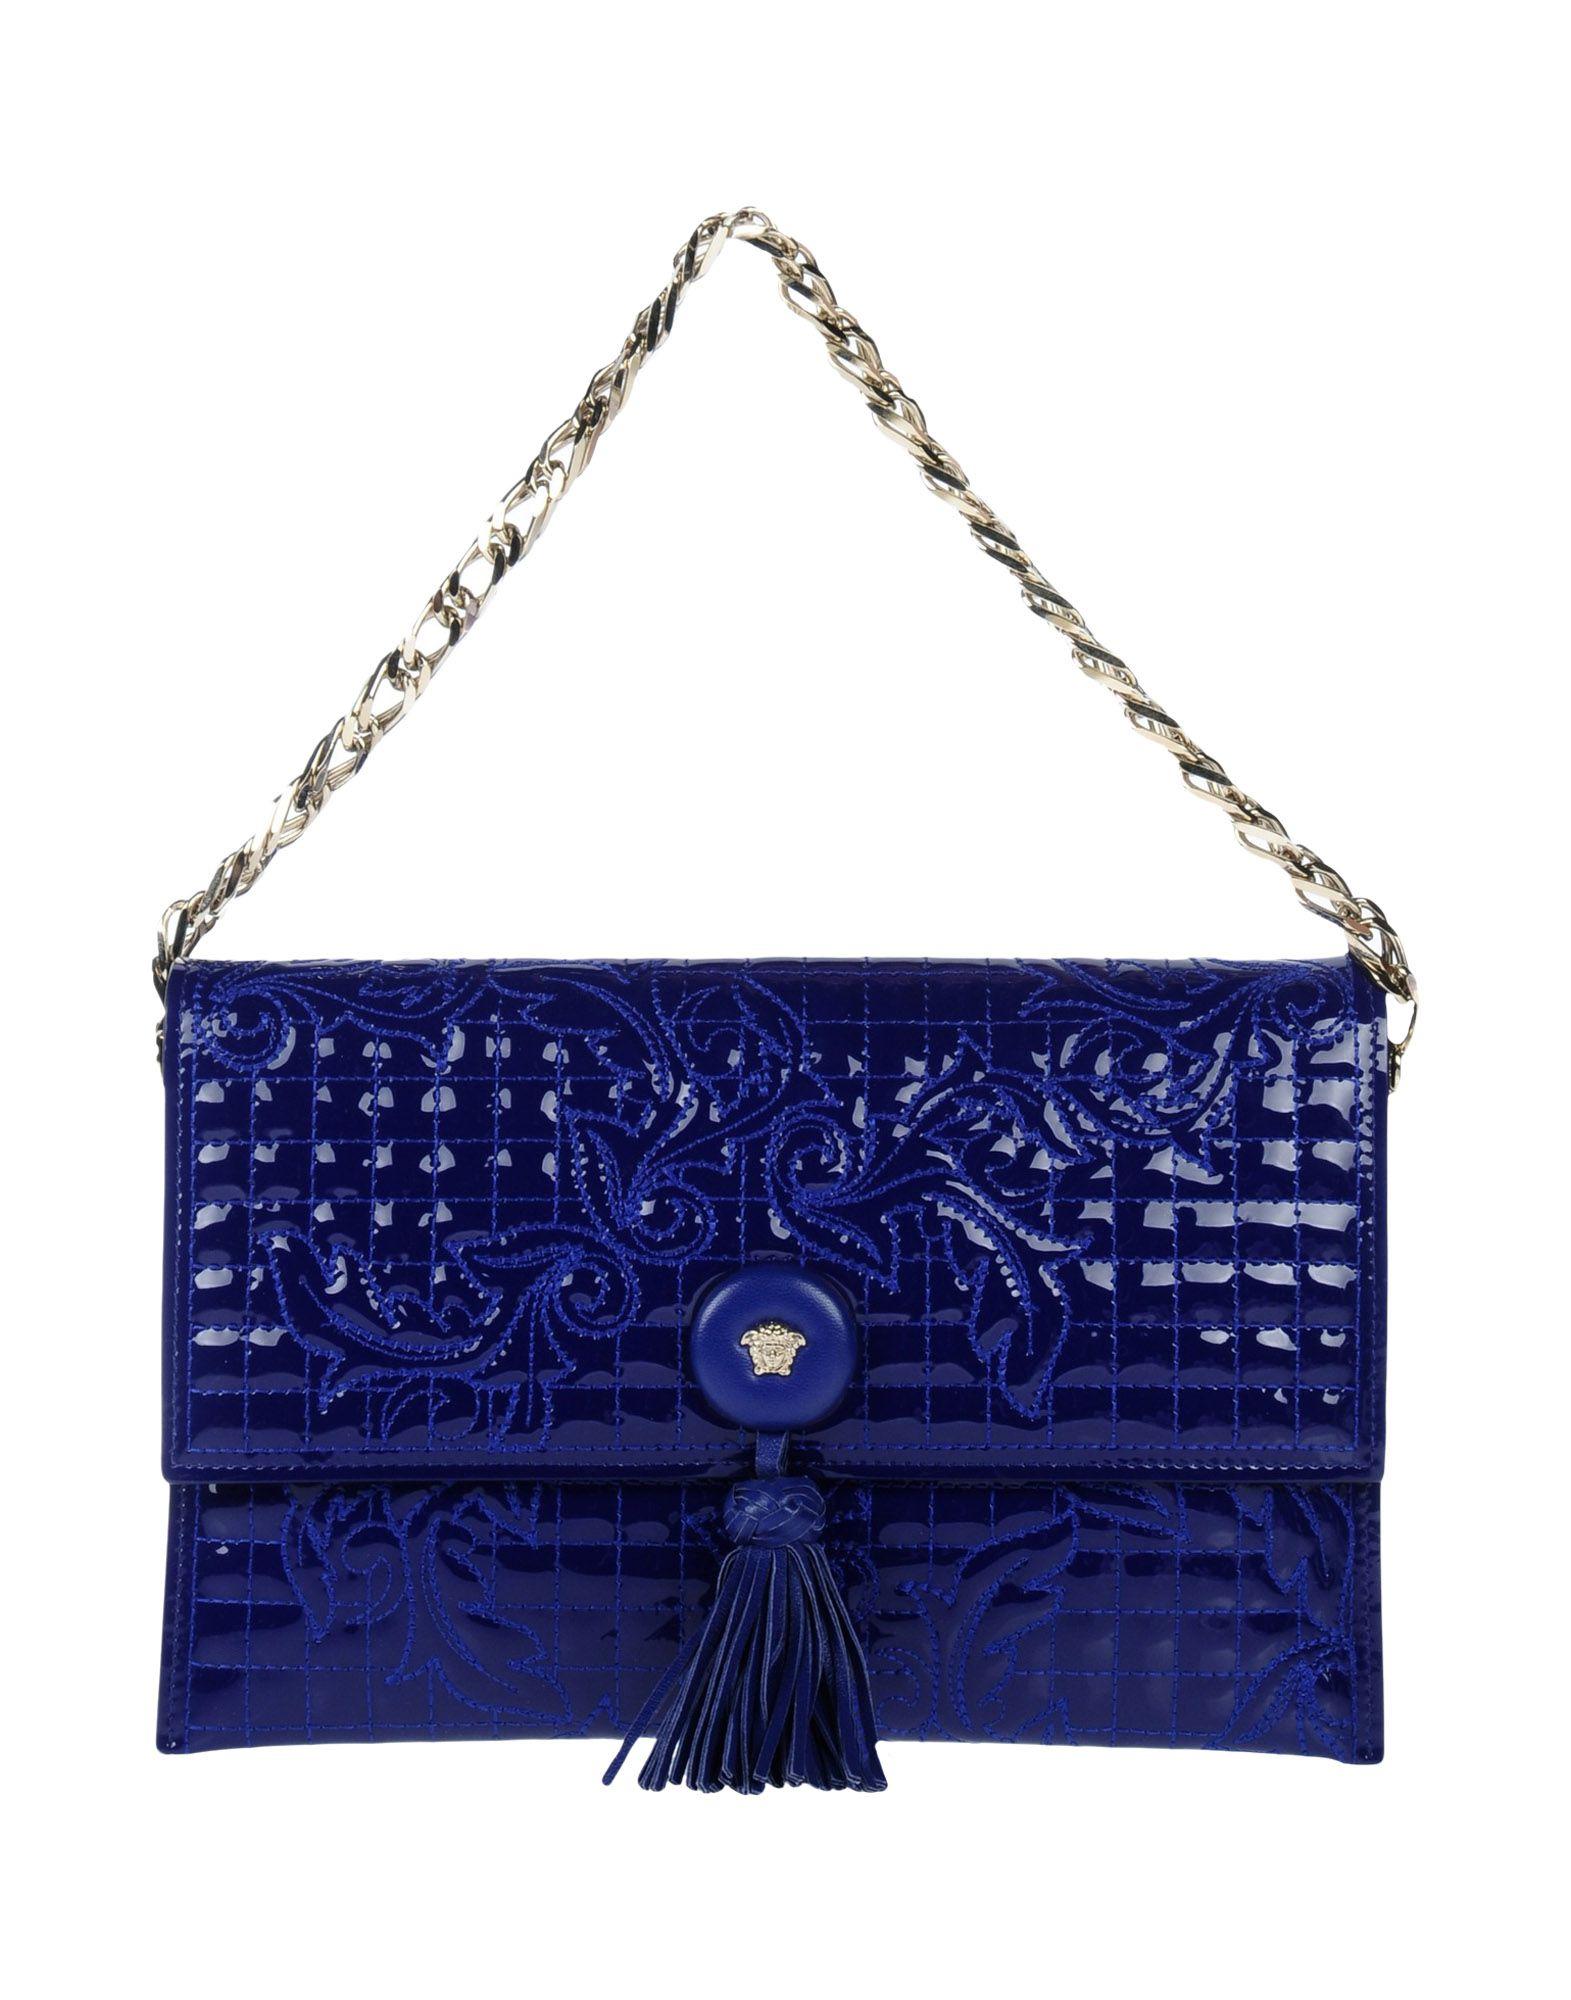 GIANNI VERSACE Handbag in Blue